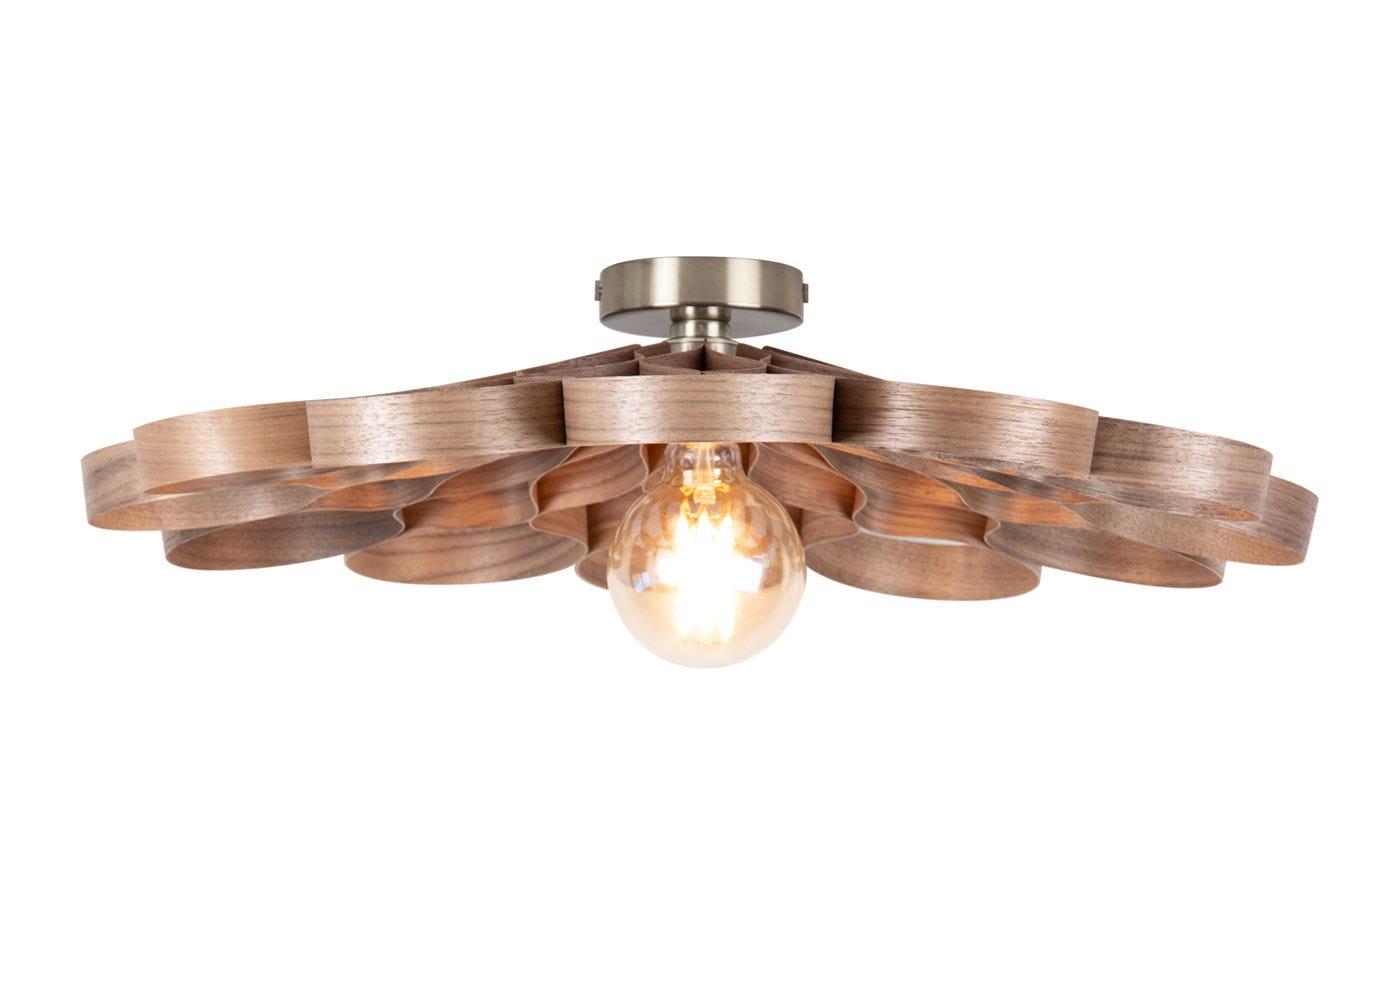 Arame Flush Ceiling Light Walnut.